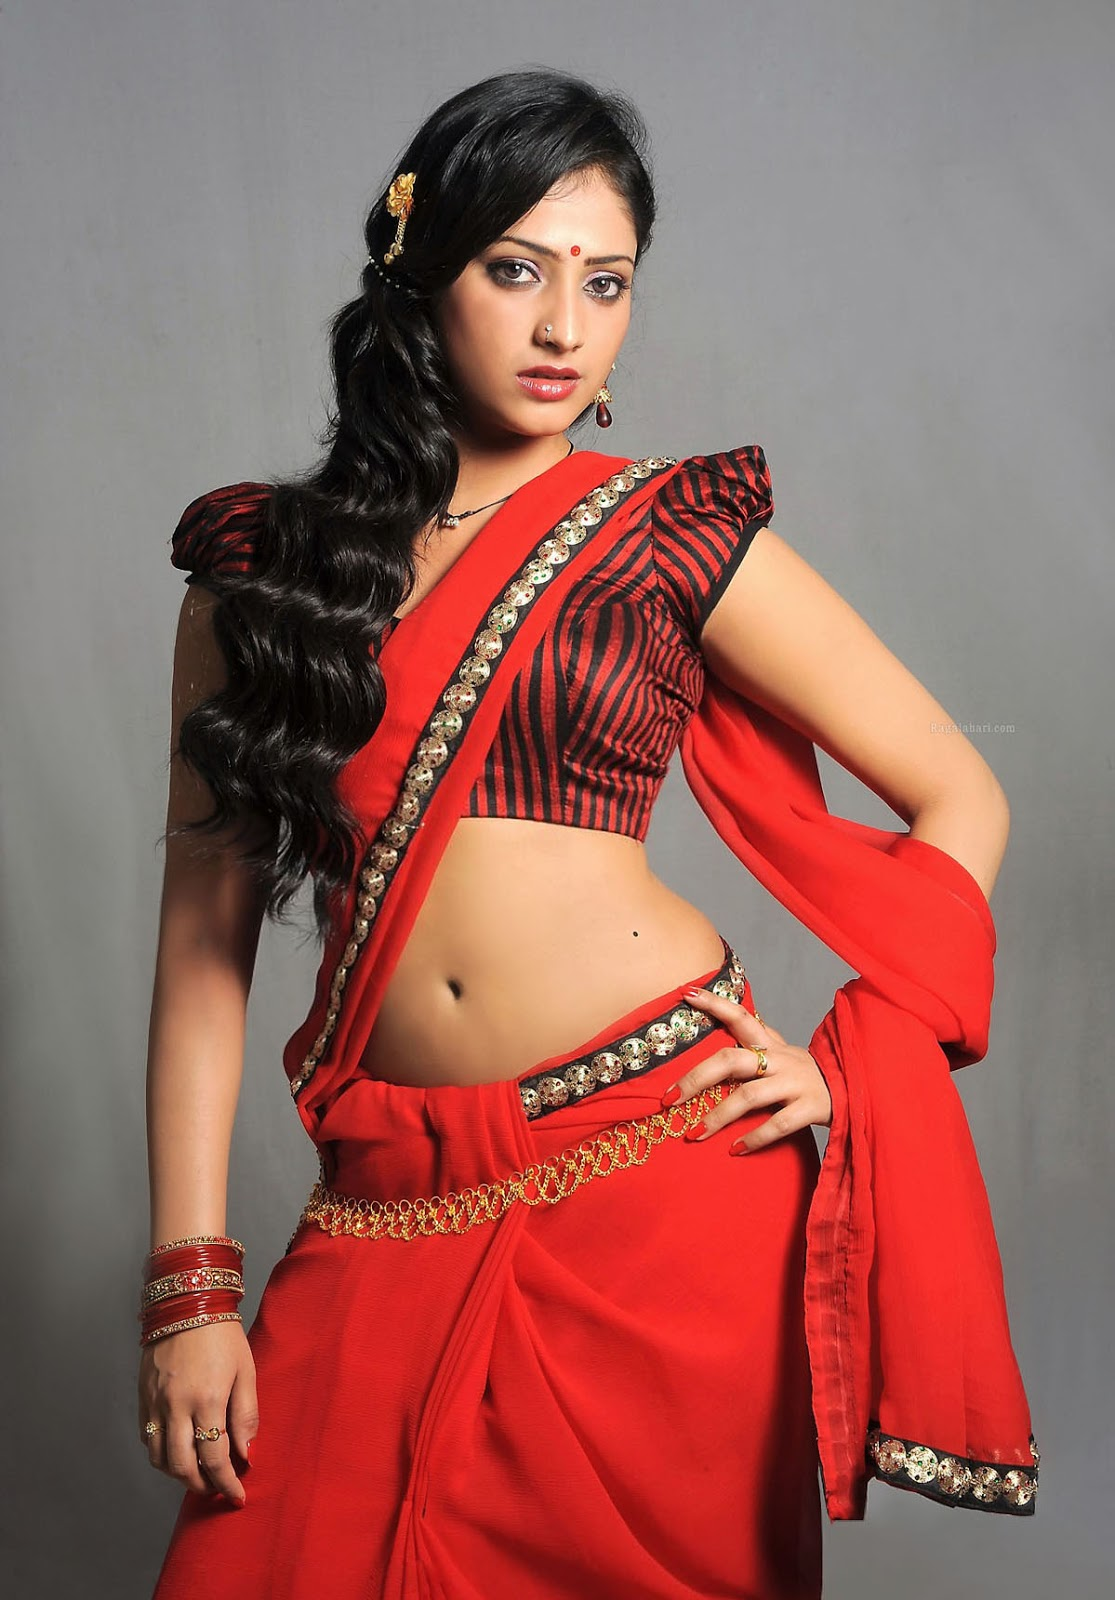 Actress sridevi sexy photos-5327